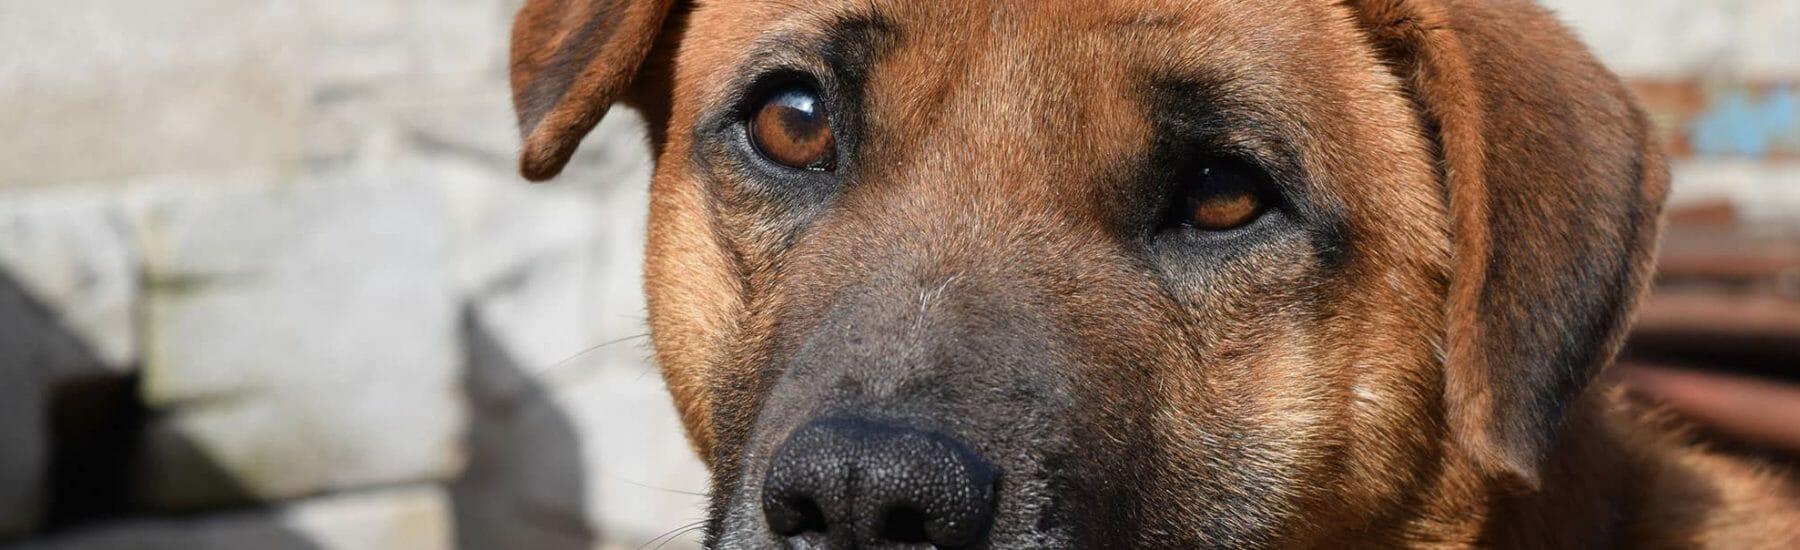 Large brown dog closeup image